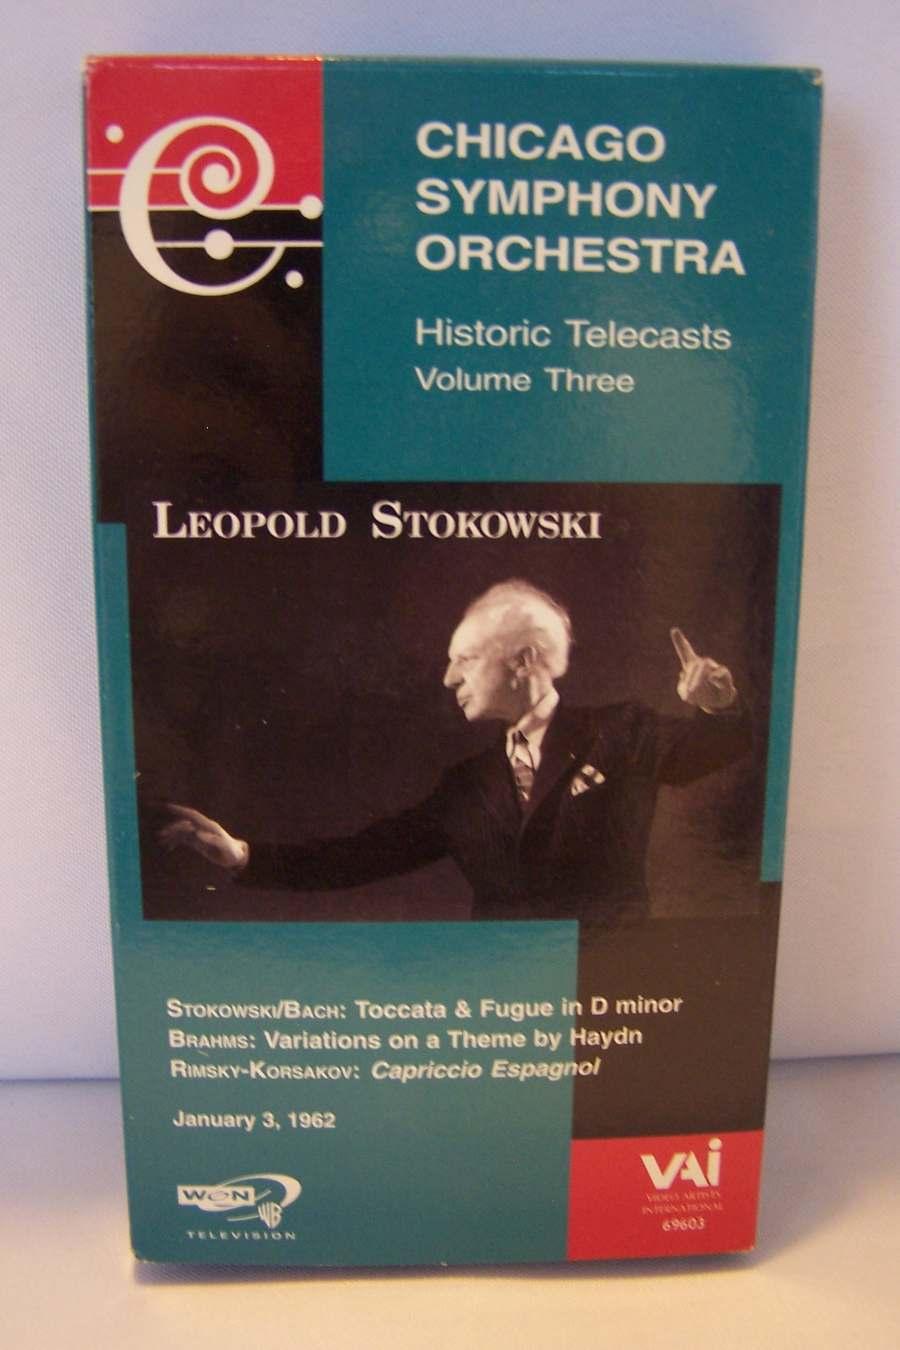 Chicago Symphony Orchestra: Historic Telecasts Vol 3 Le